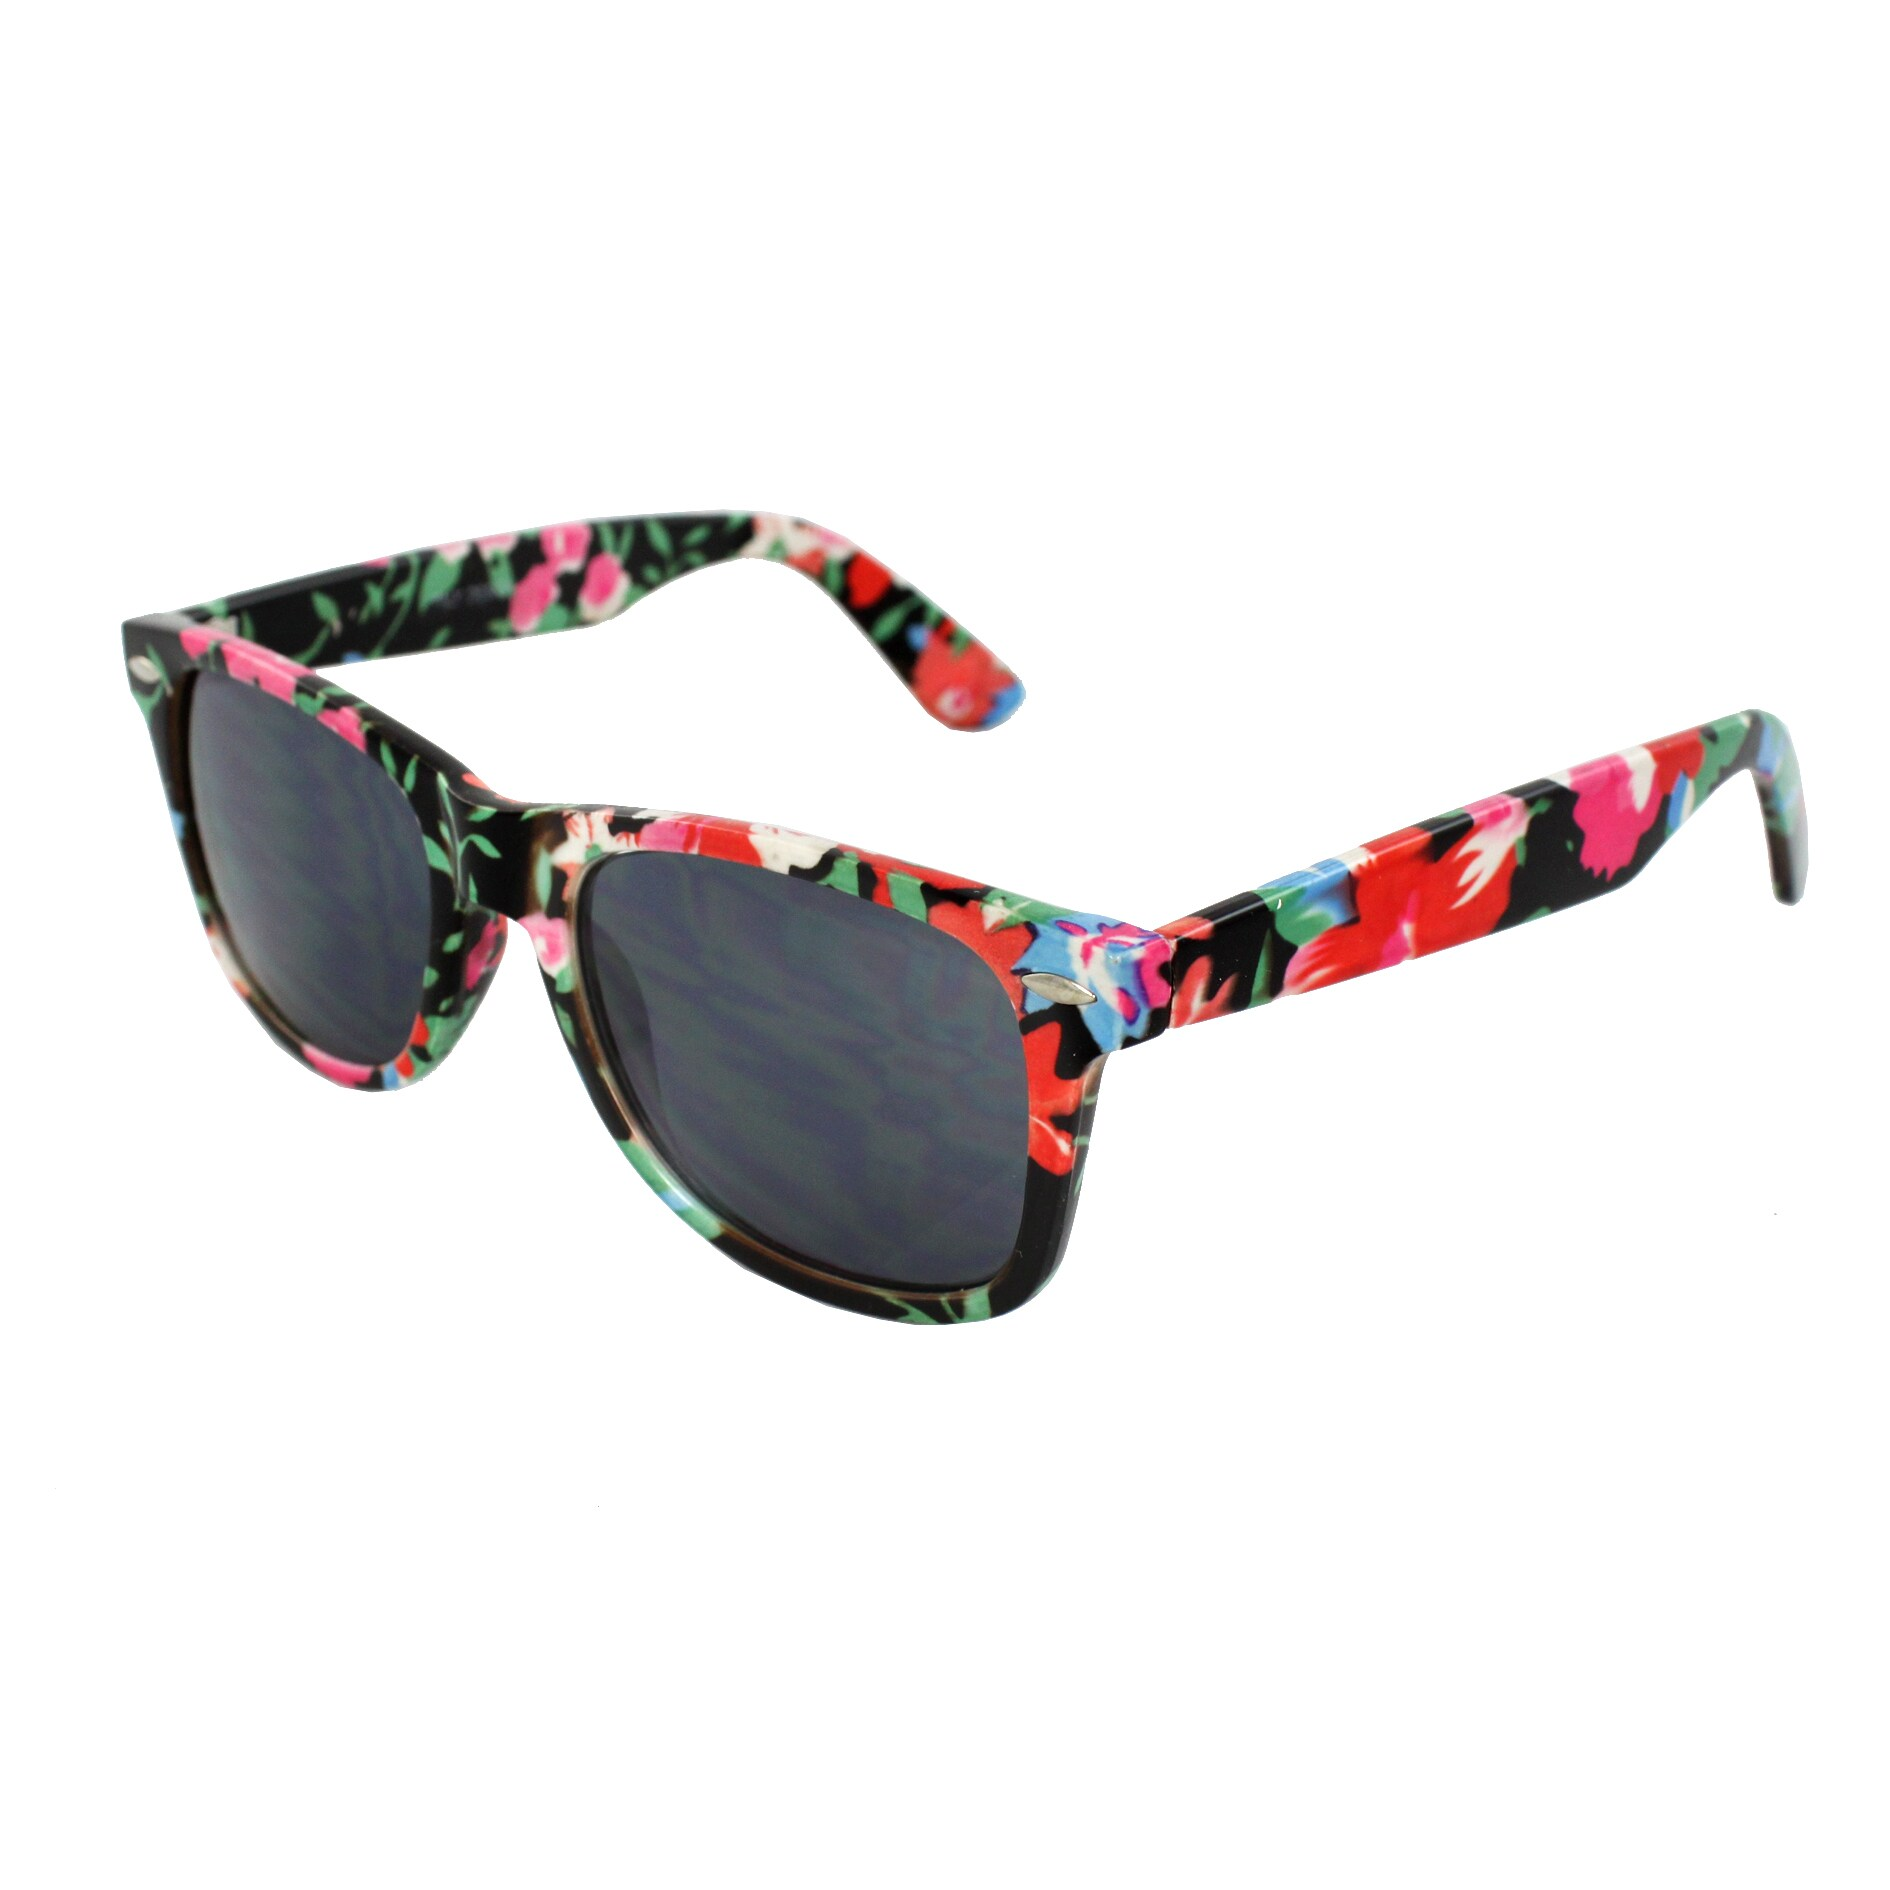 Women's Floral Pattern Sunglasses